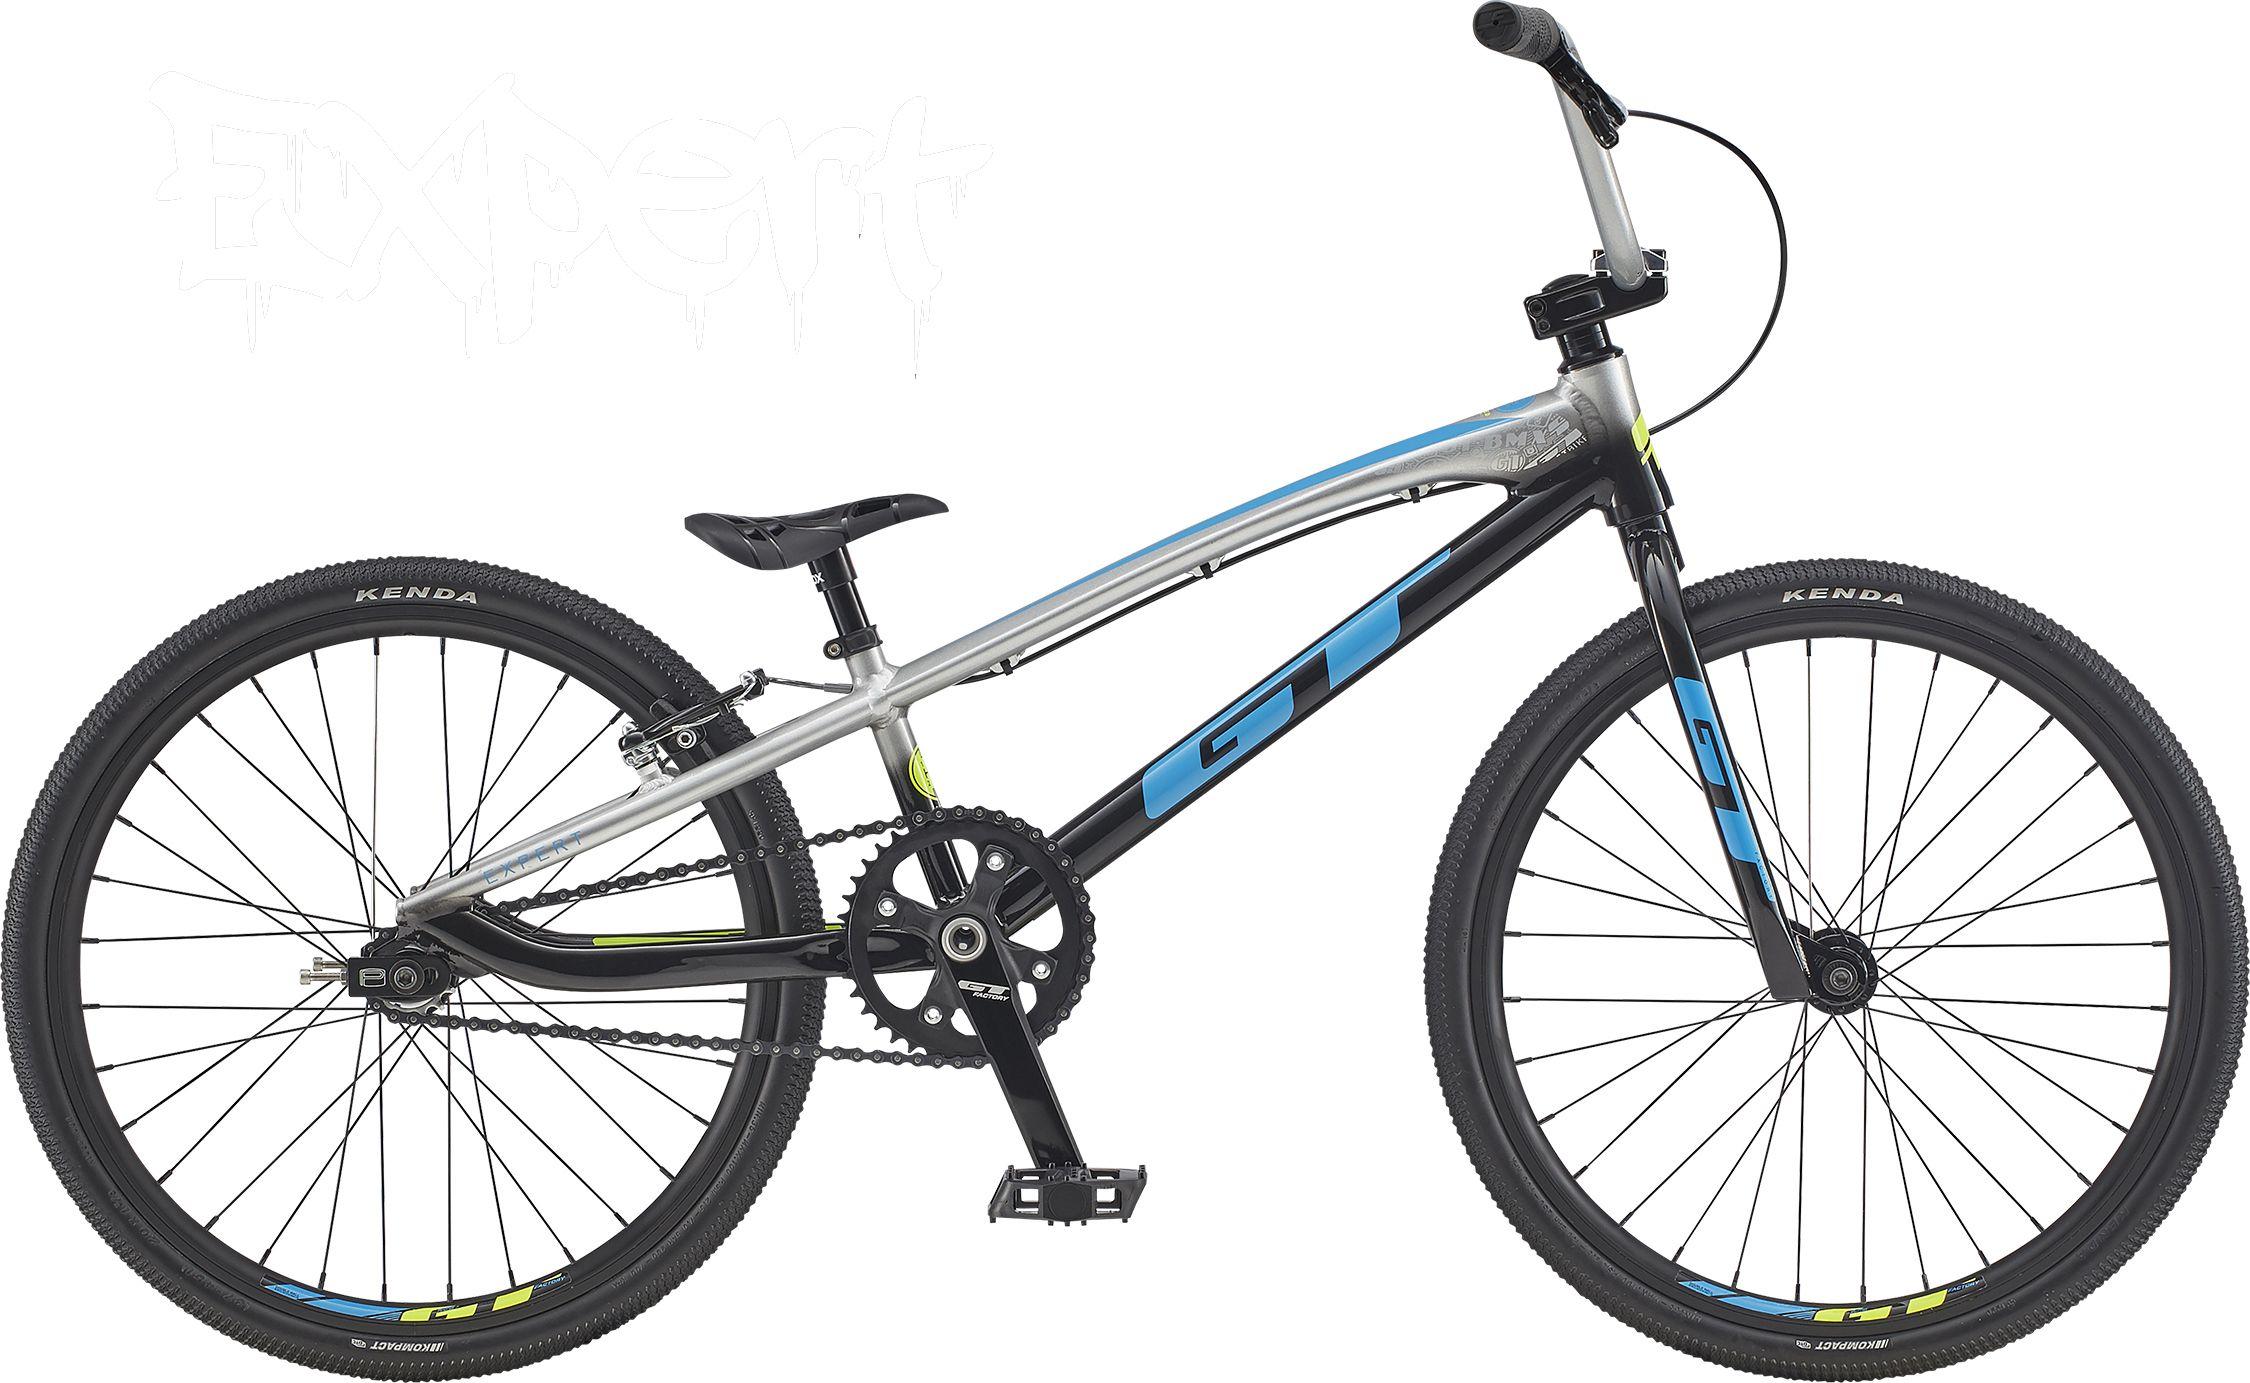 Gt Speed Series 20 Bmx Race Bike